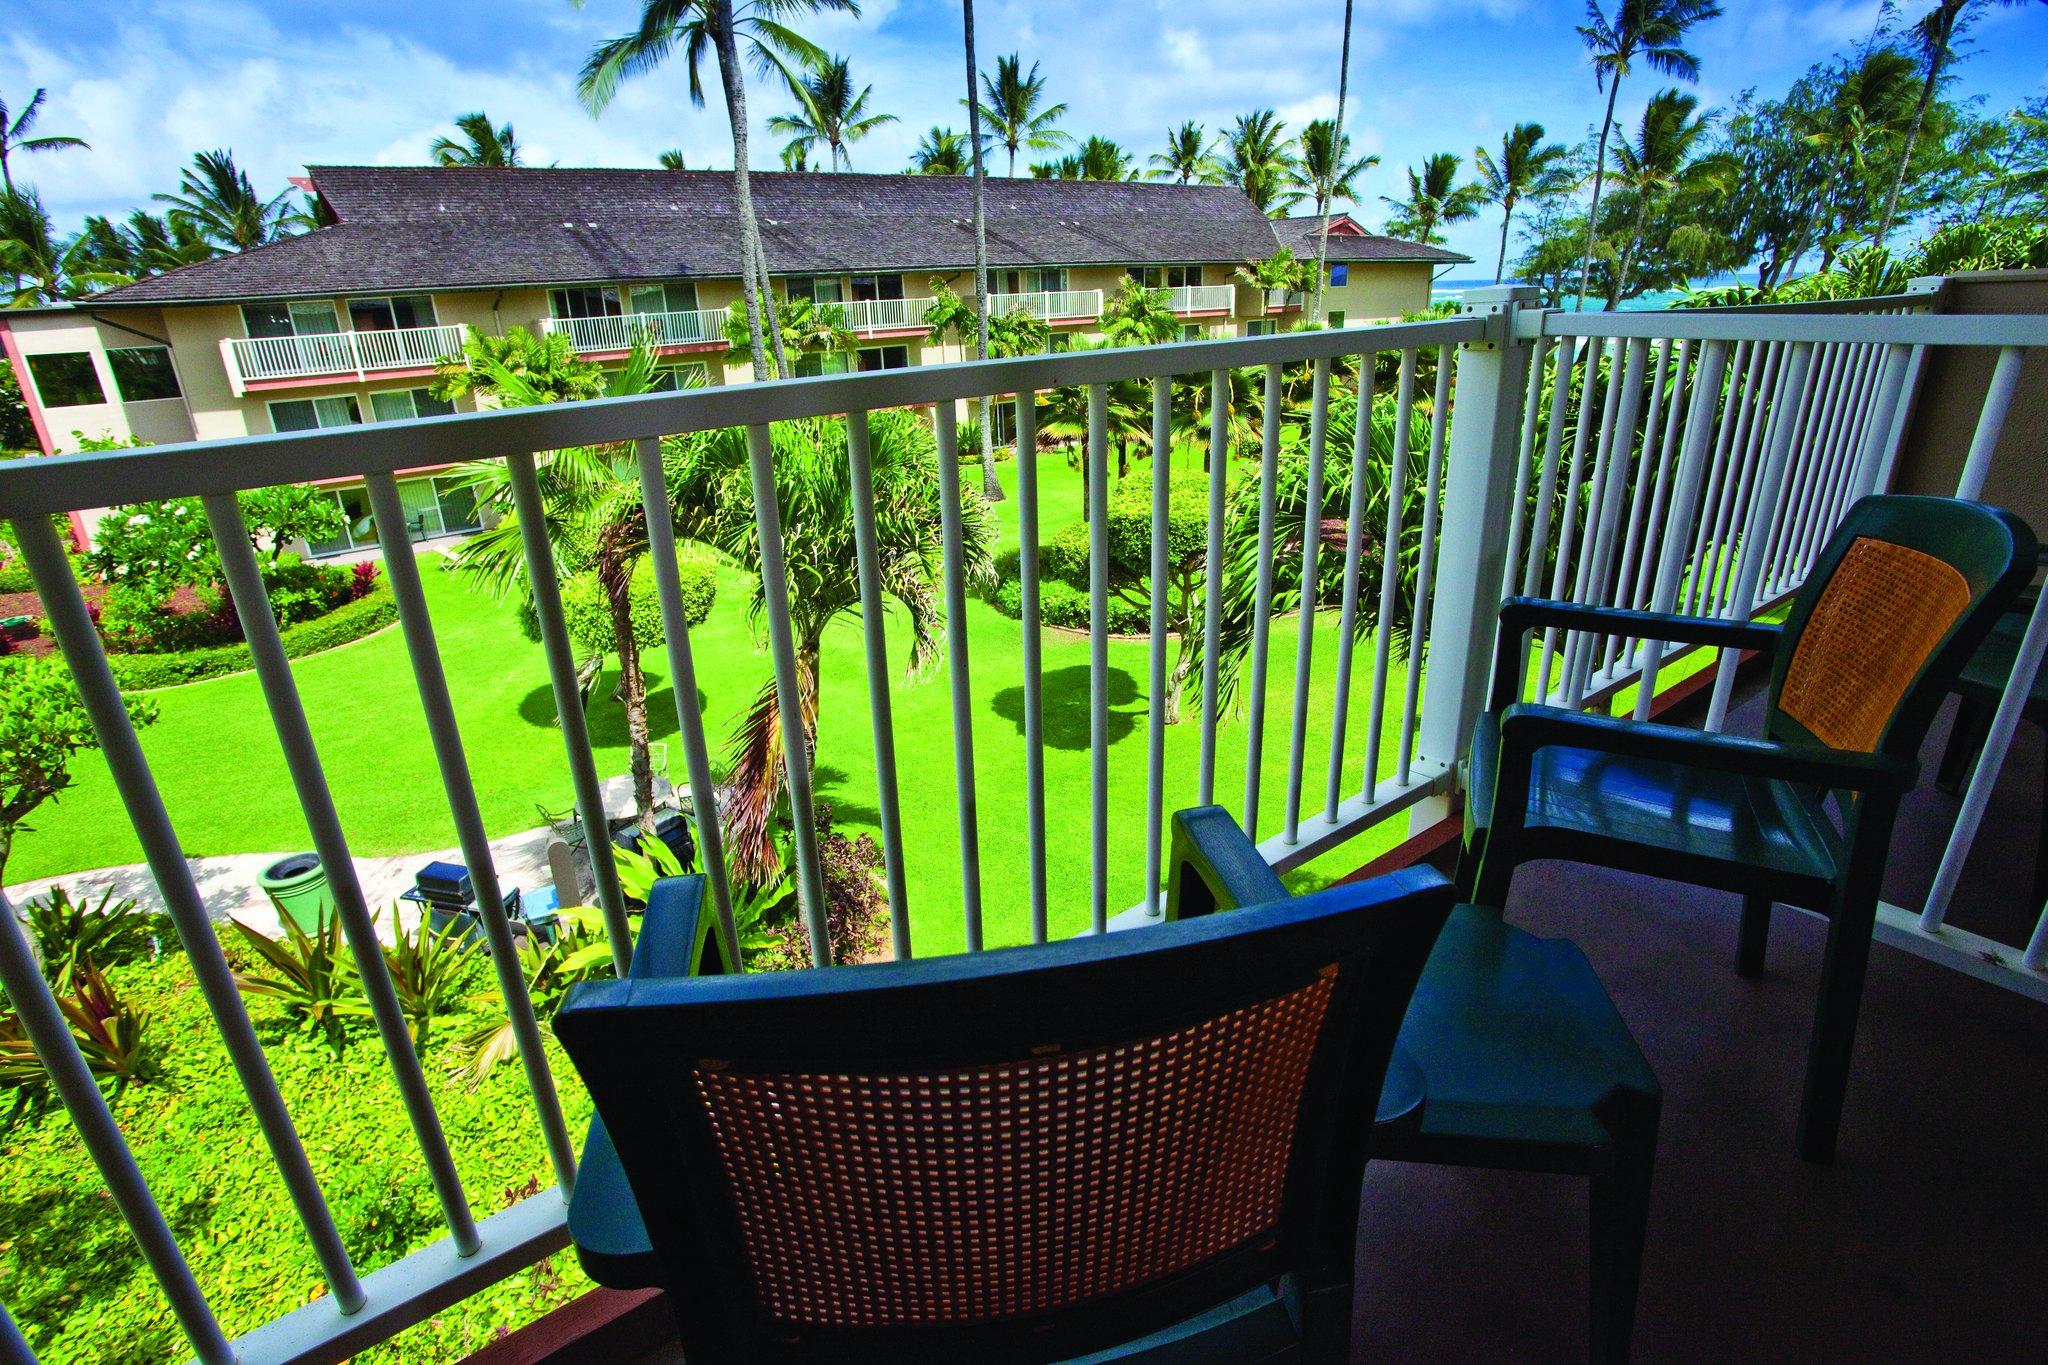 Kauai Coast Resort At The Beachboy | Kauai Coast Resort at the Beachboy